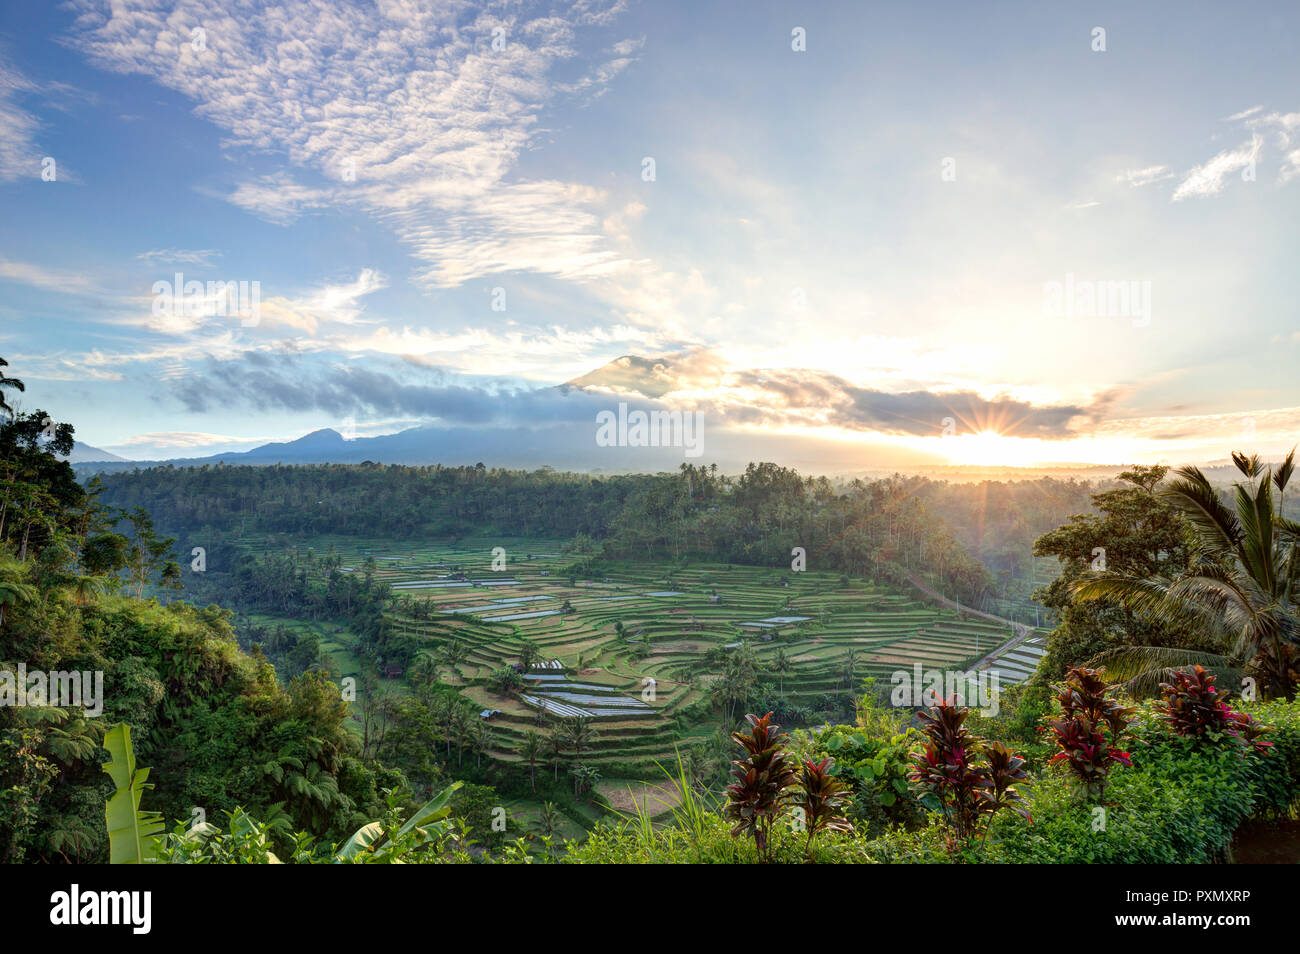 Blick auf Reisterrassen und Vulkan Gunung Agung bei Sonnenaufgang, Rendang, Bali, Indonesien Stockbild